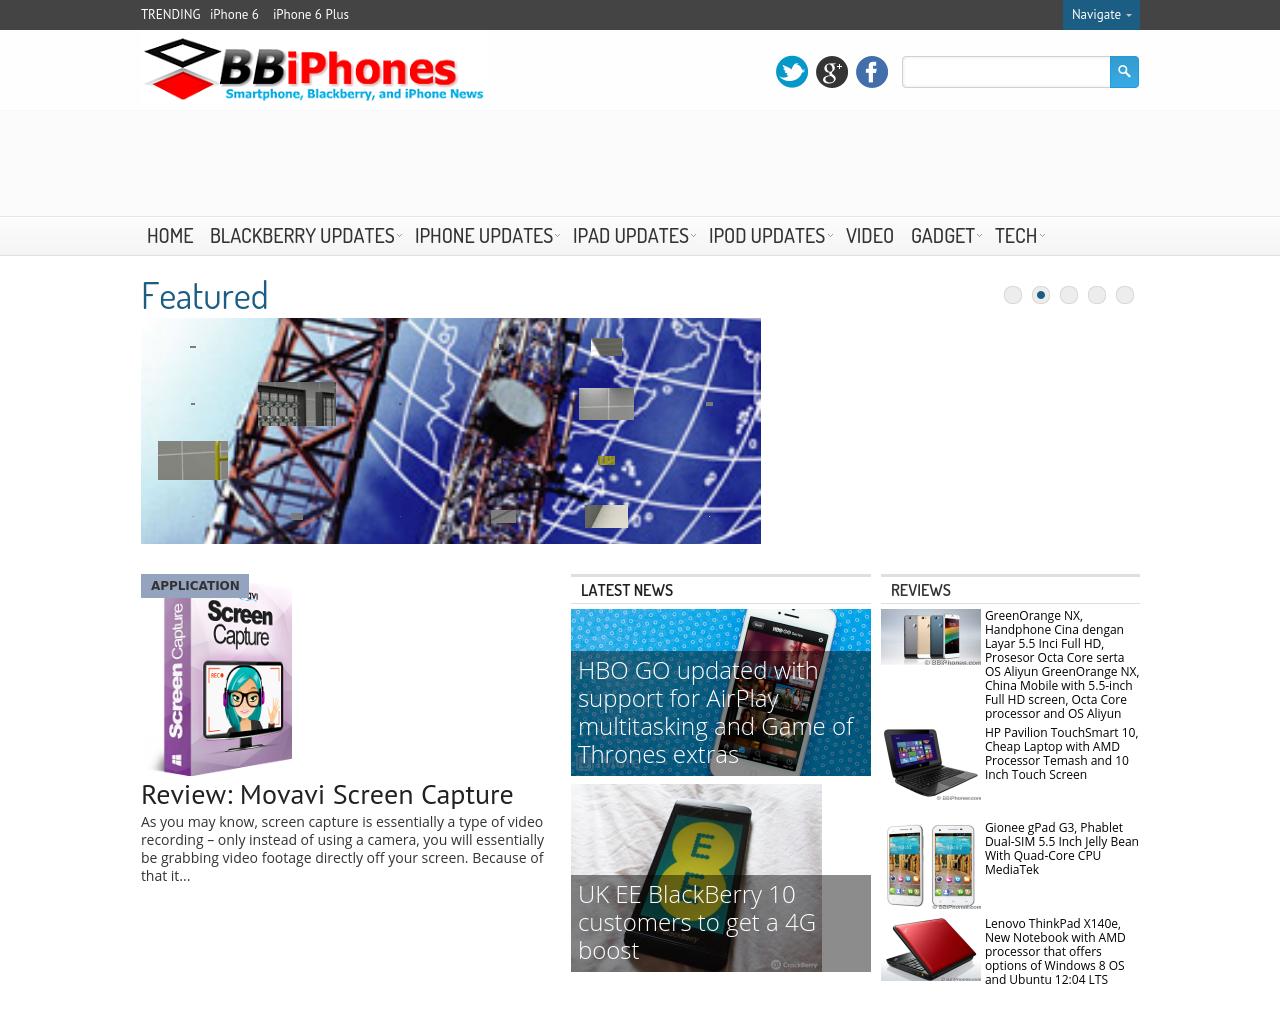 BBiPhones-Advertising-Reviews-Pricing